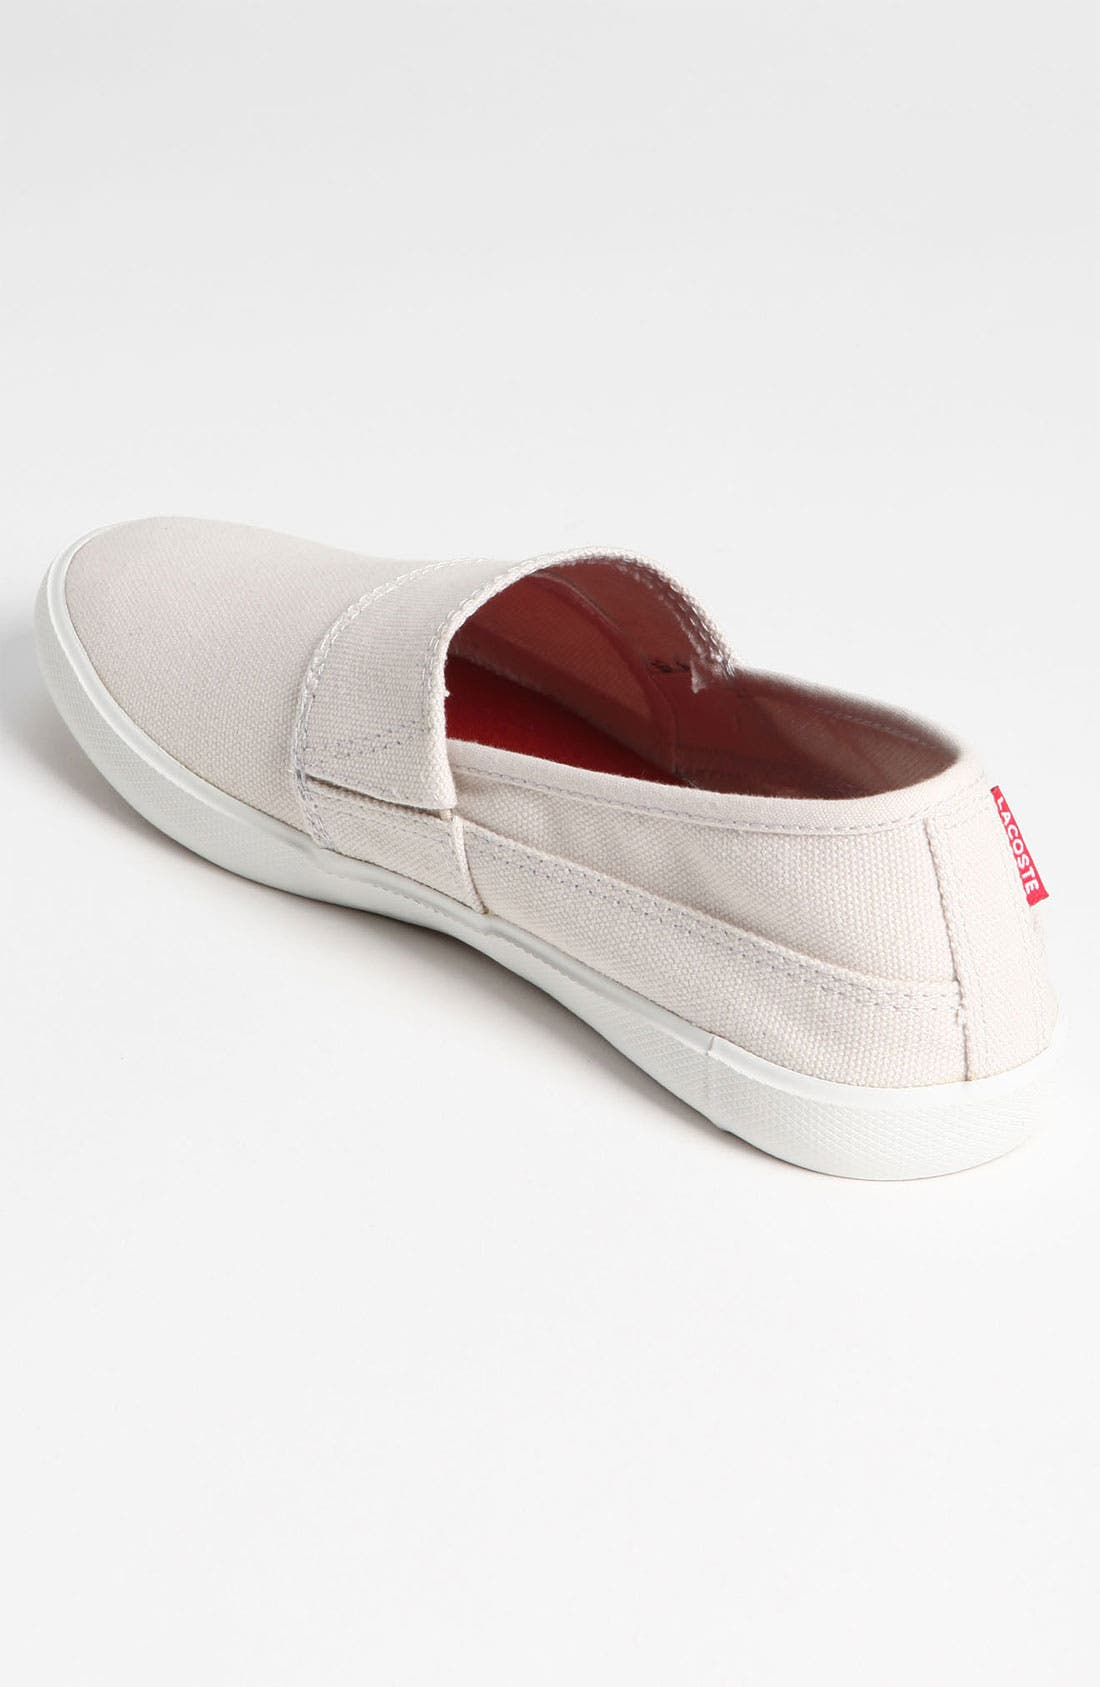 Alternate Image 2  - Lacoste 'Clemente CI' Slip-On Sneaker